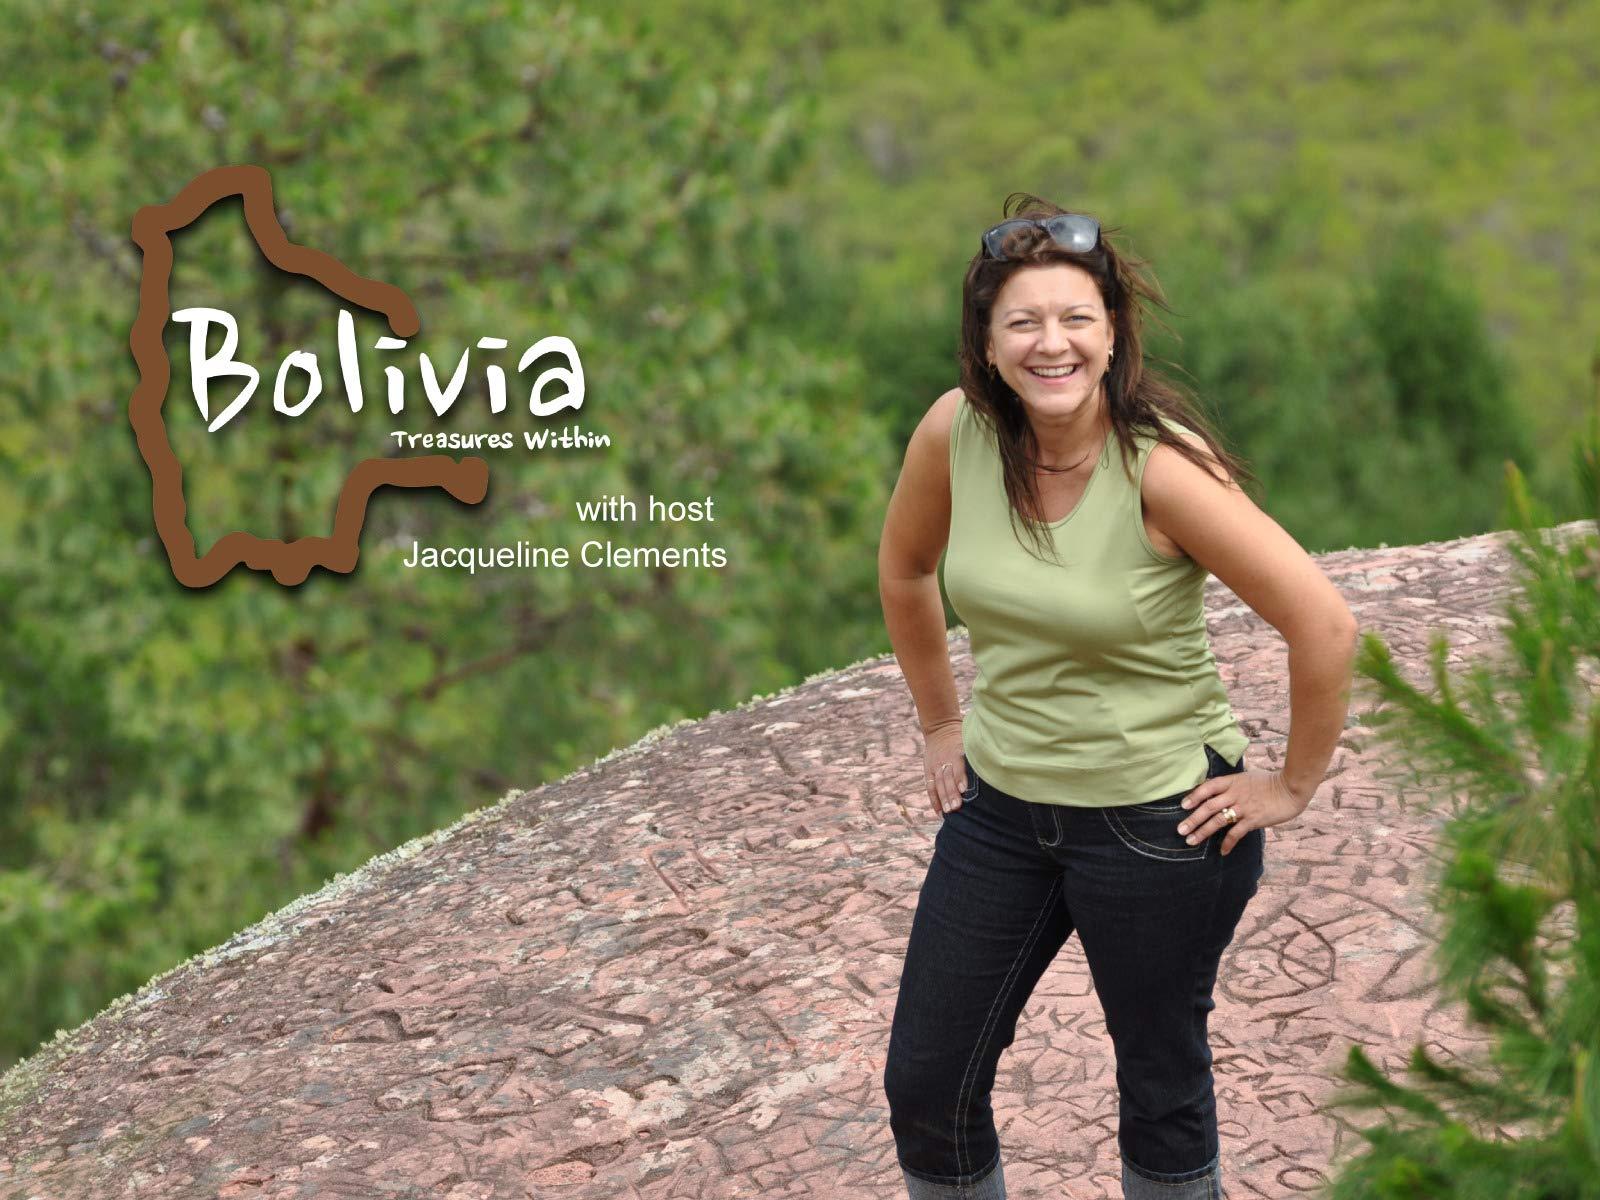 Bolivia: Treasures Within - Season 1